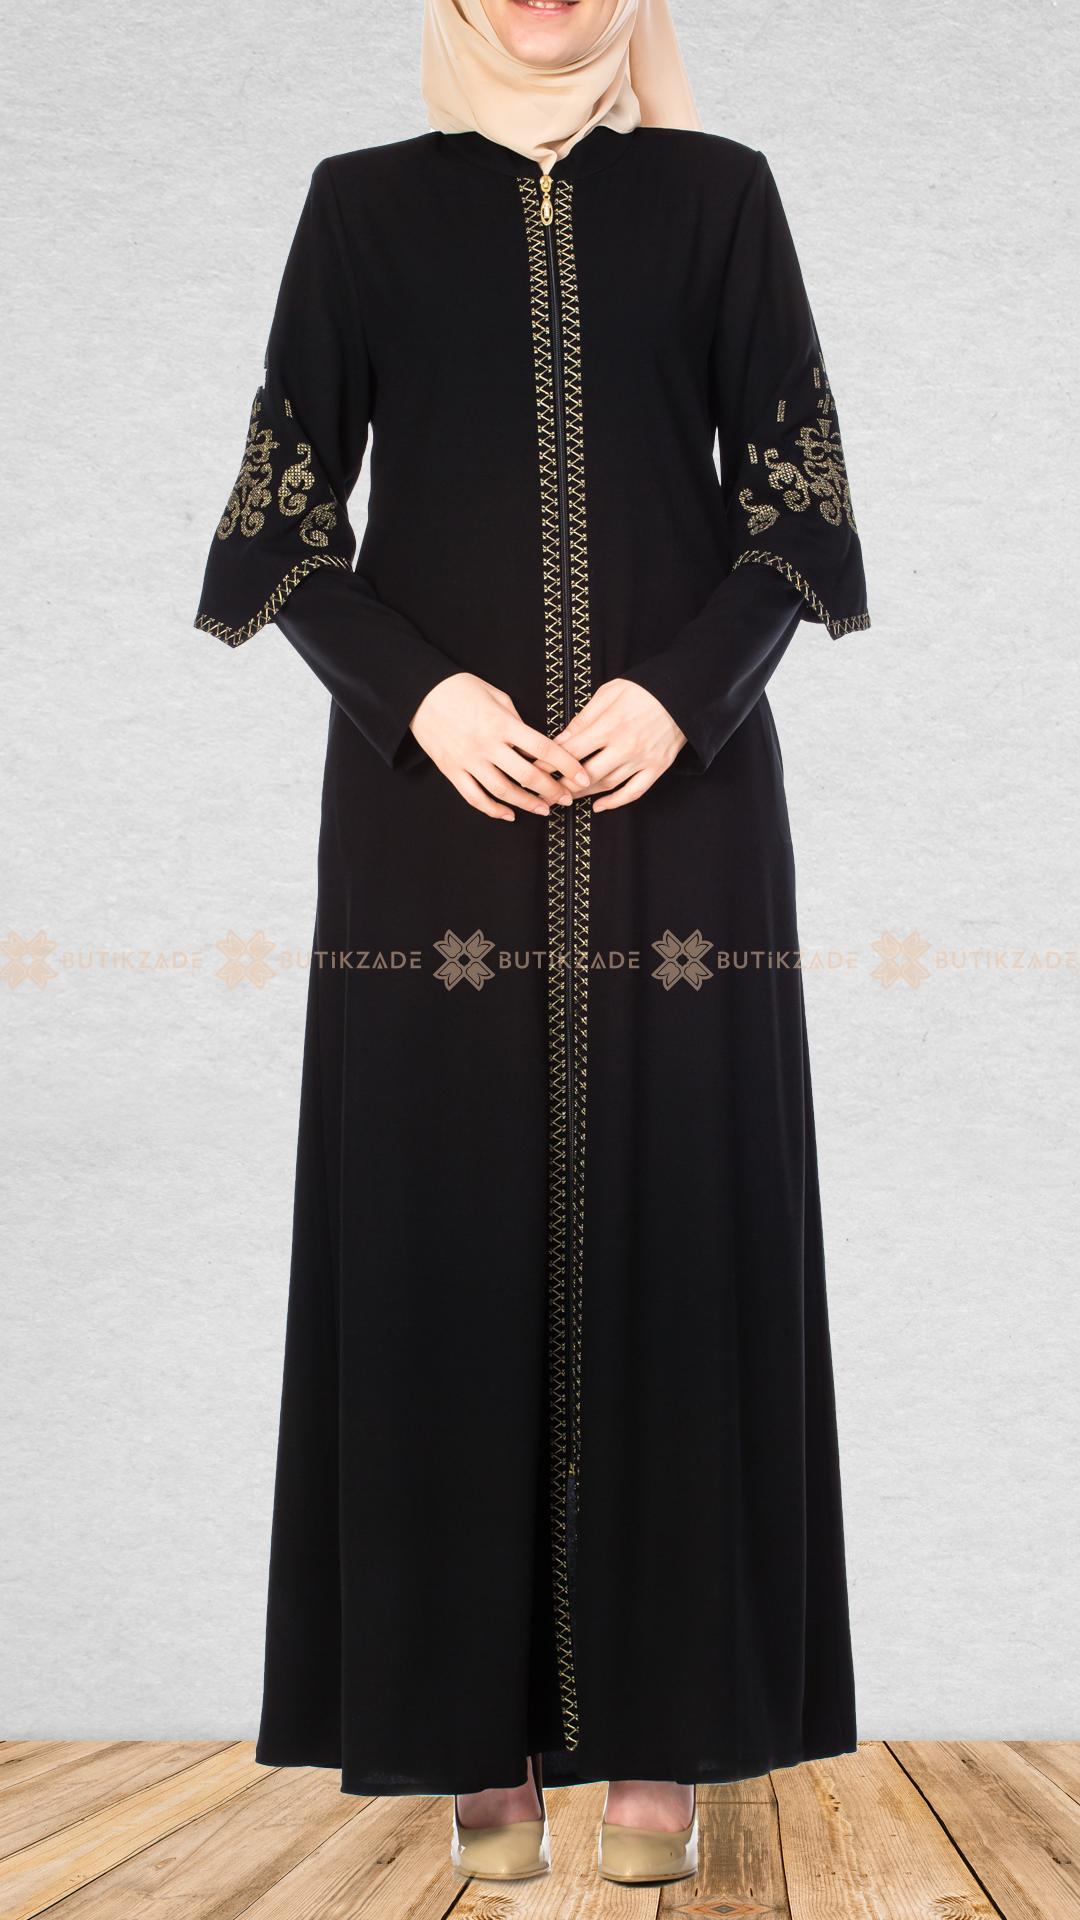 Kanavice Nakisli Siyah Ferace Islami Giyim Islami Moda Elbise